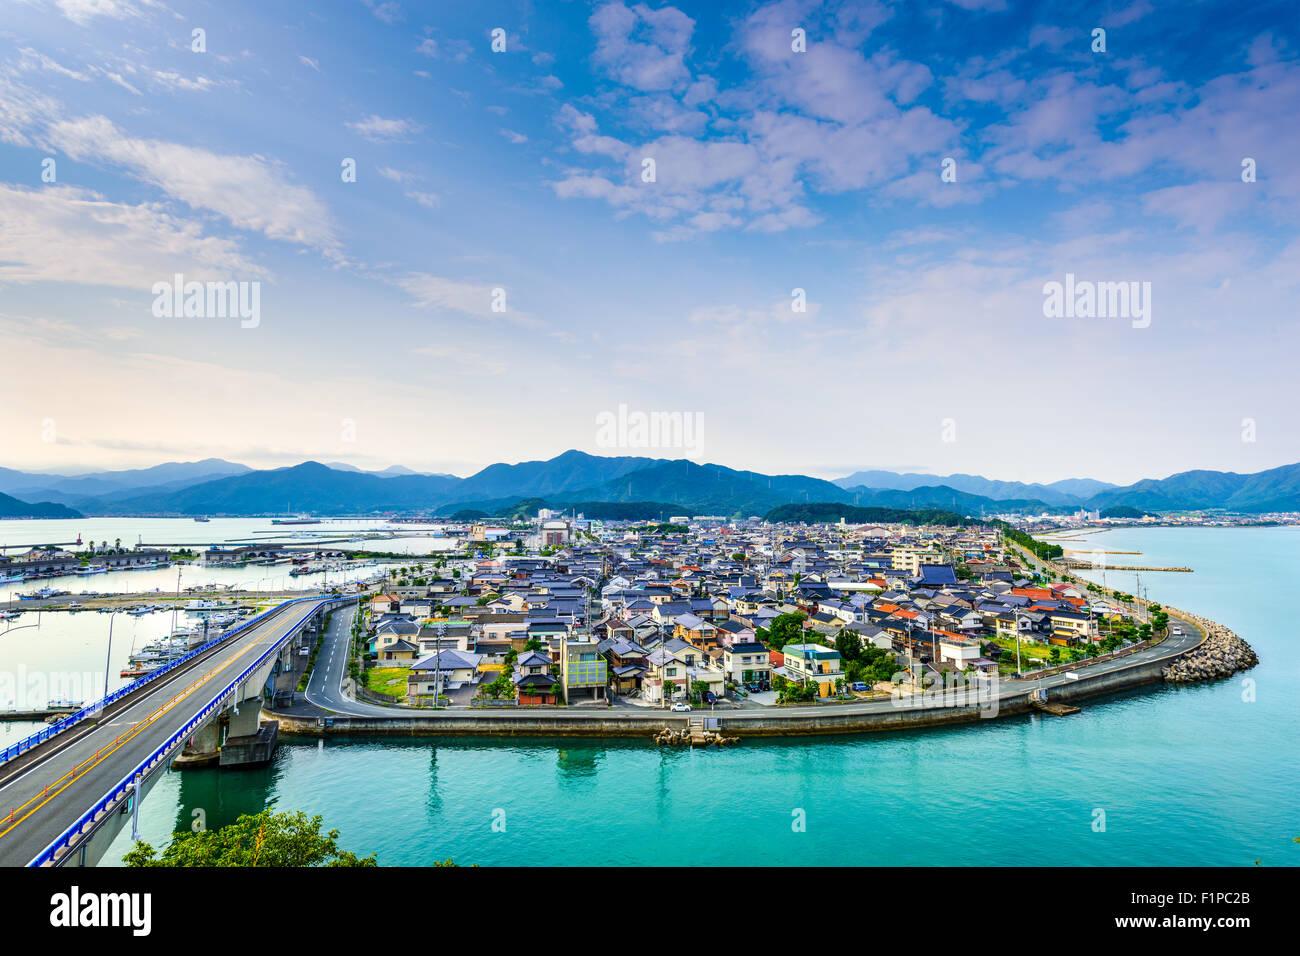 Senzaki, Nagato, Yamaguchi Giappone vista città. Immagini Stock